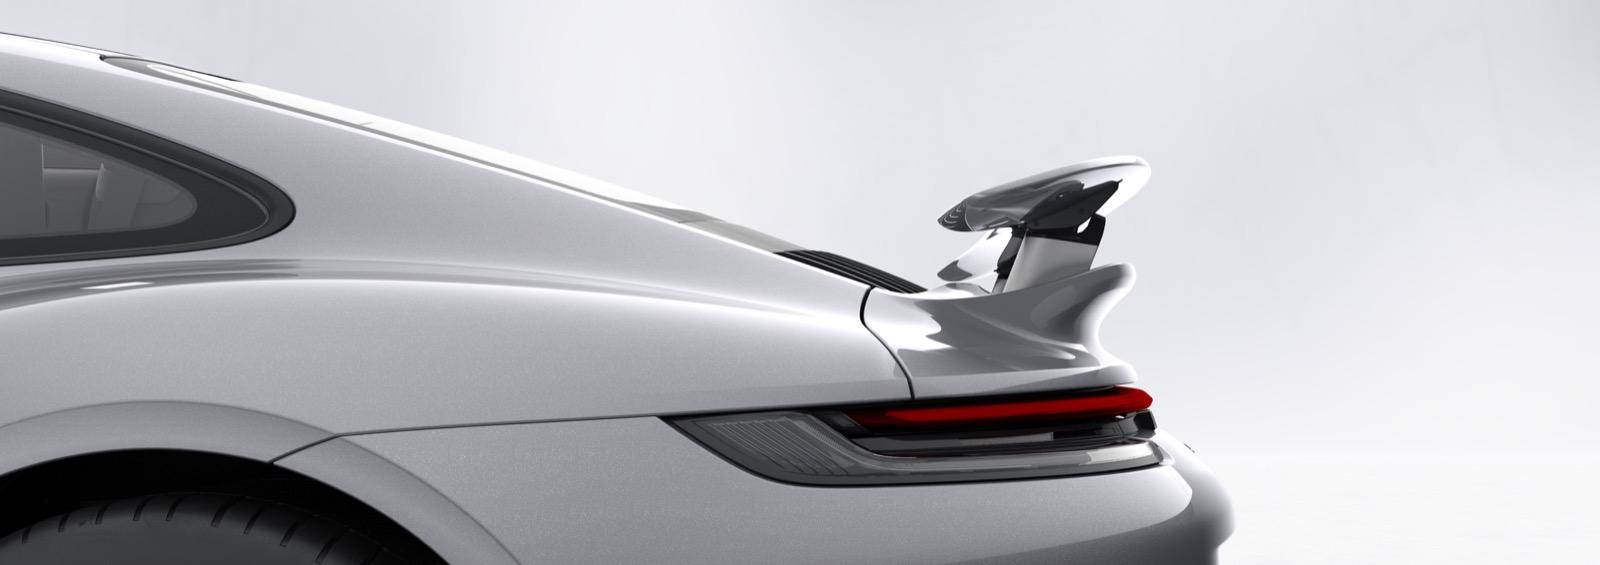 Porsche 911 Turbo 9